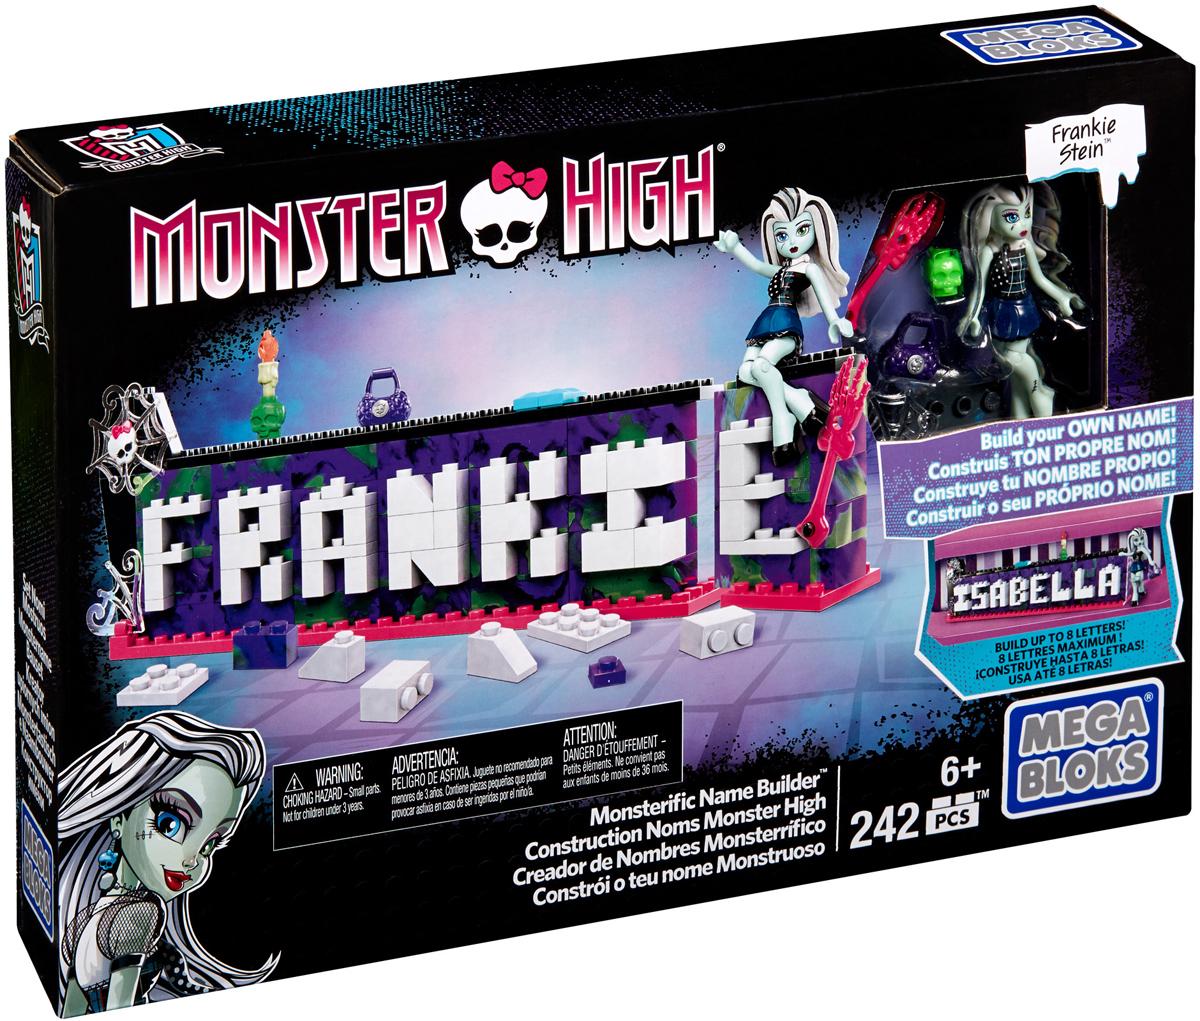 Mega Bloks Monster High Конструктор Табличка для имени